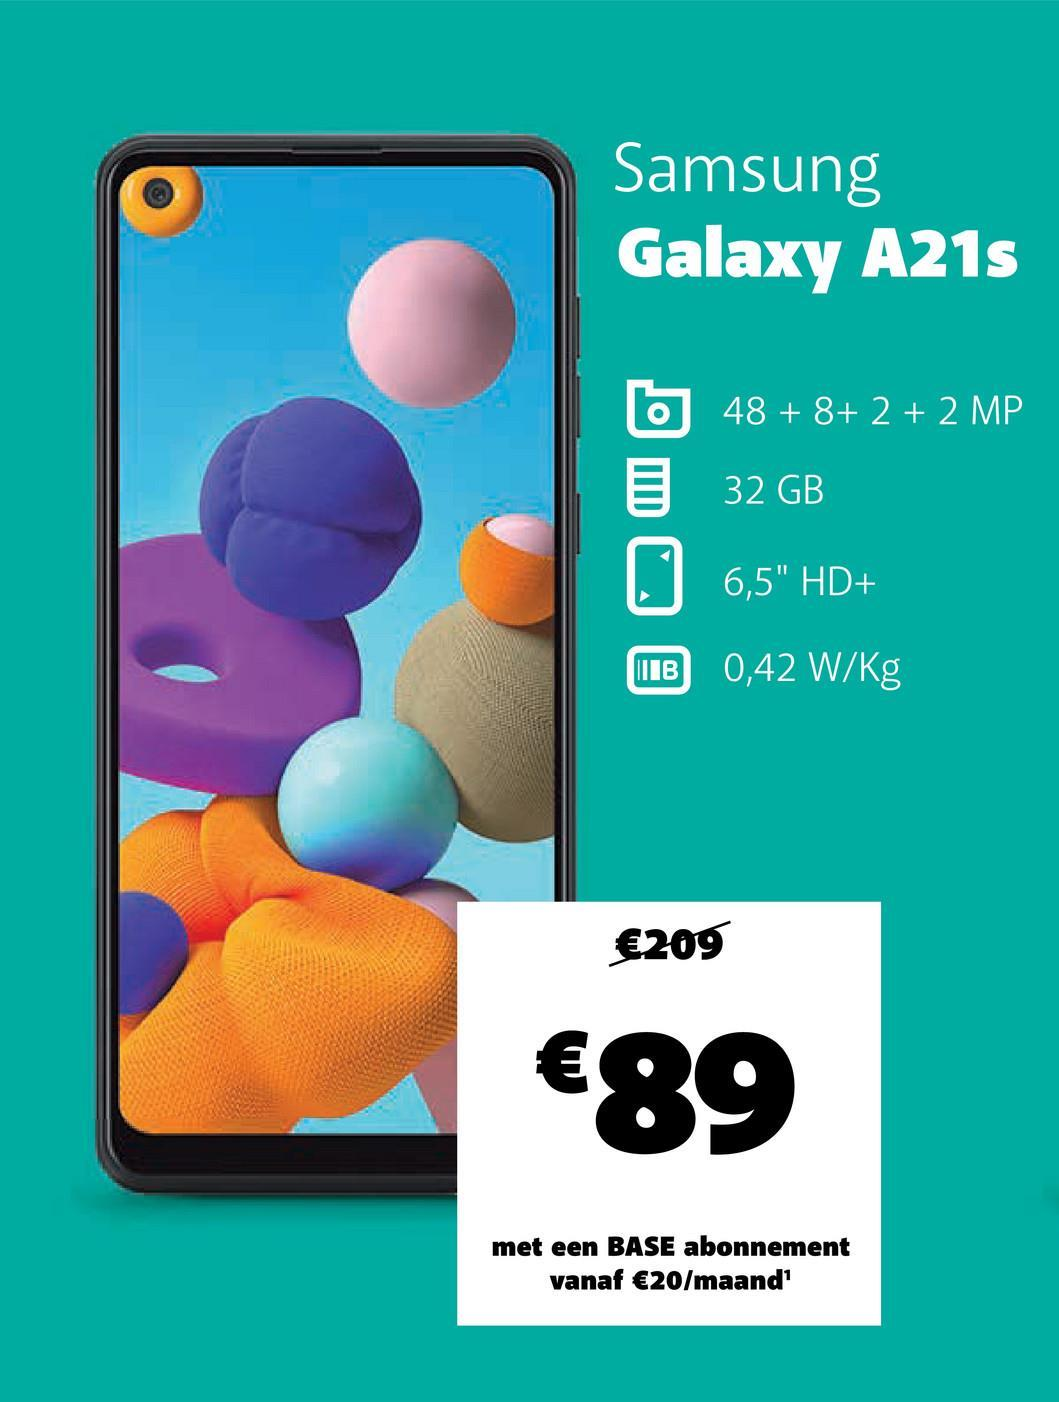 "Samsung Galaxy A21s O 48 + 8+ 2 + 2 MP E 32 GB 6,5"" HD+ MTB 0,42 W/kg €209 €89 met een BASE abonnement vanaf €20/maand'"